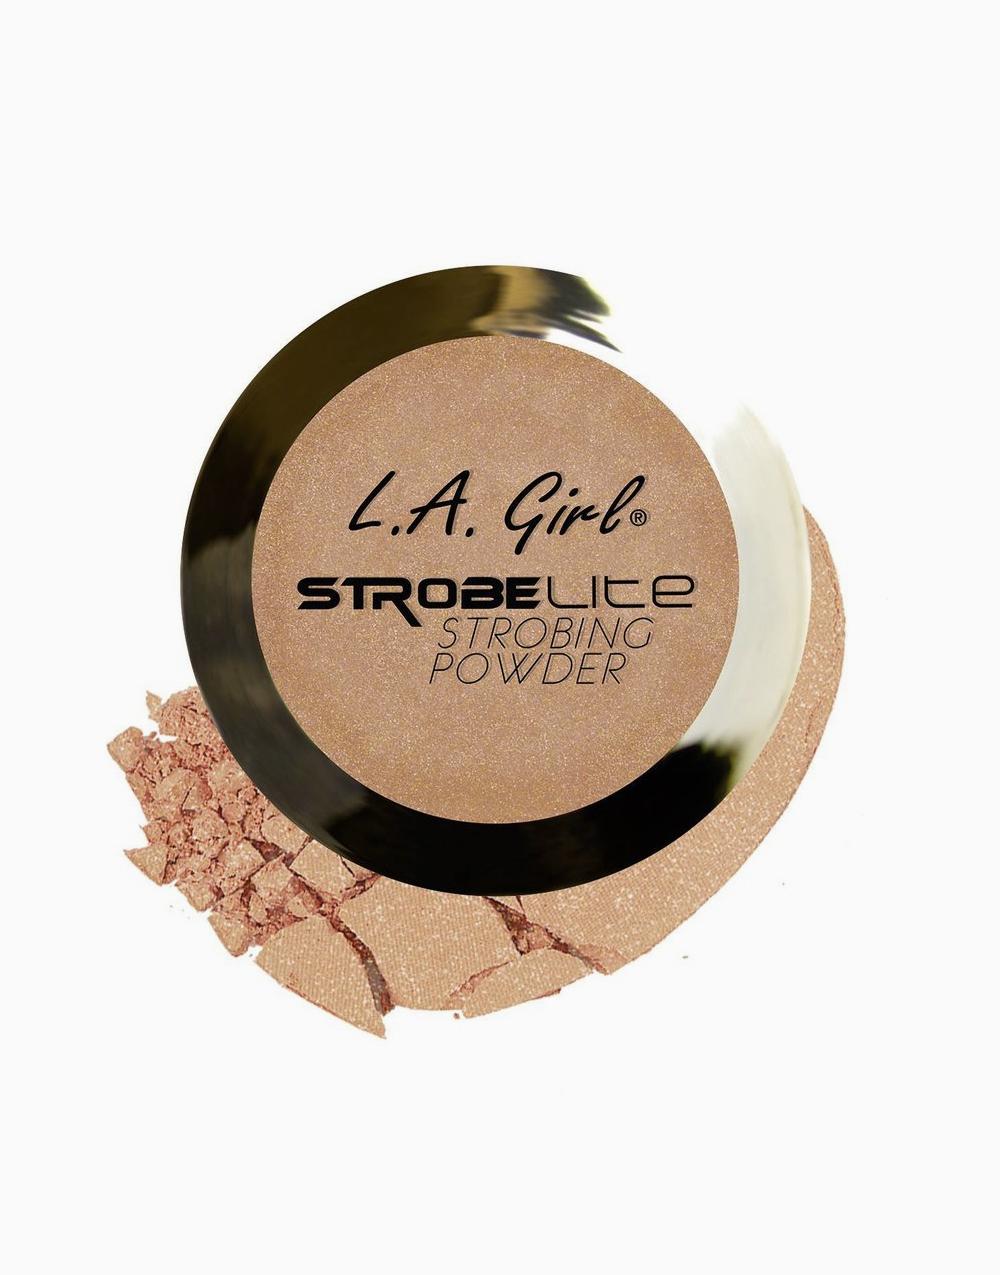 Strobelite Strobing Powder by L.A. Girl | 50 WATT